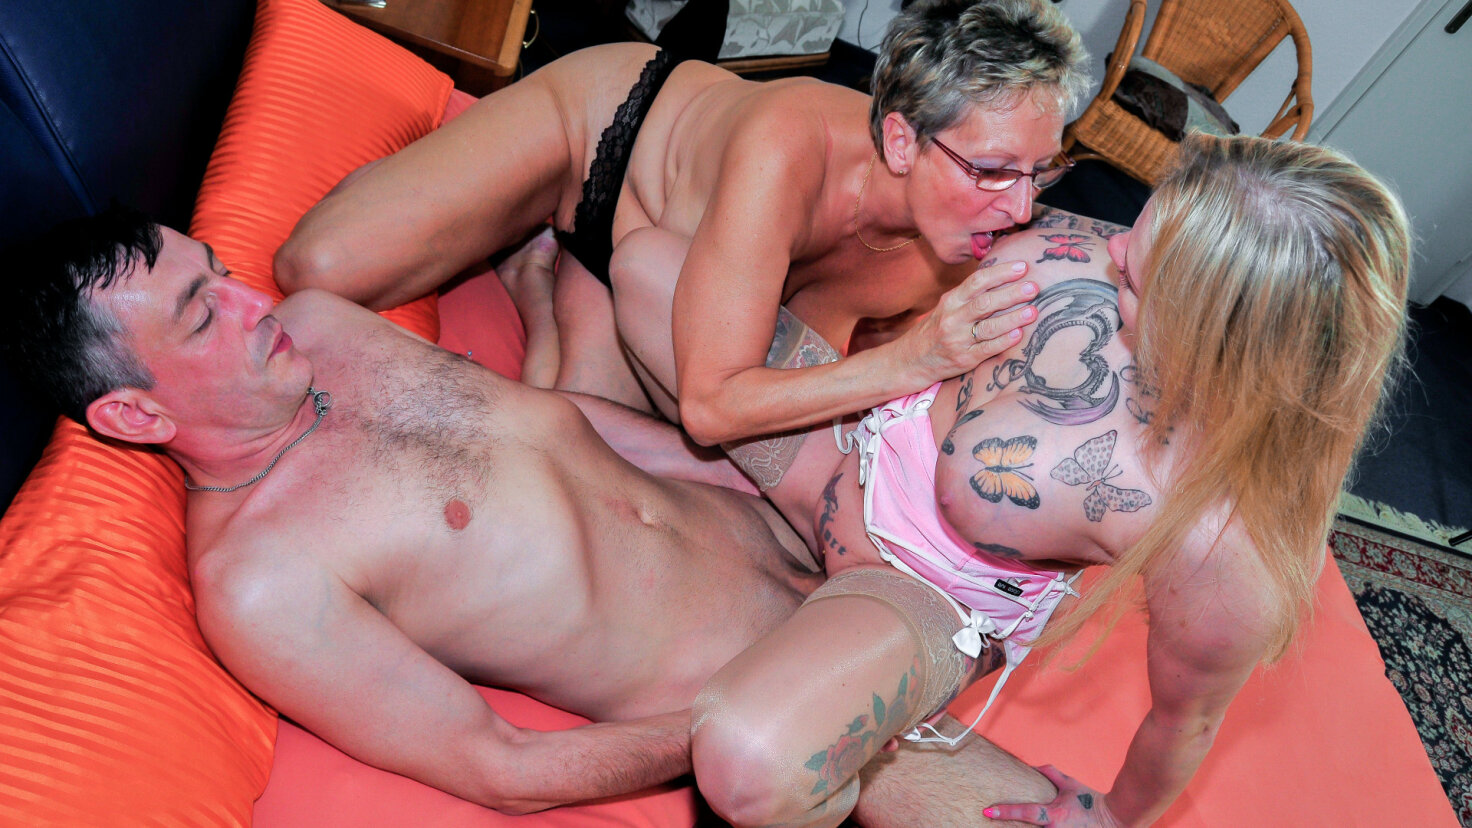 Big titted mature German blondies share cock in hardcore FFM threesome